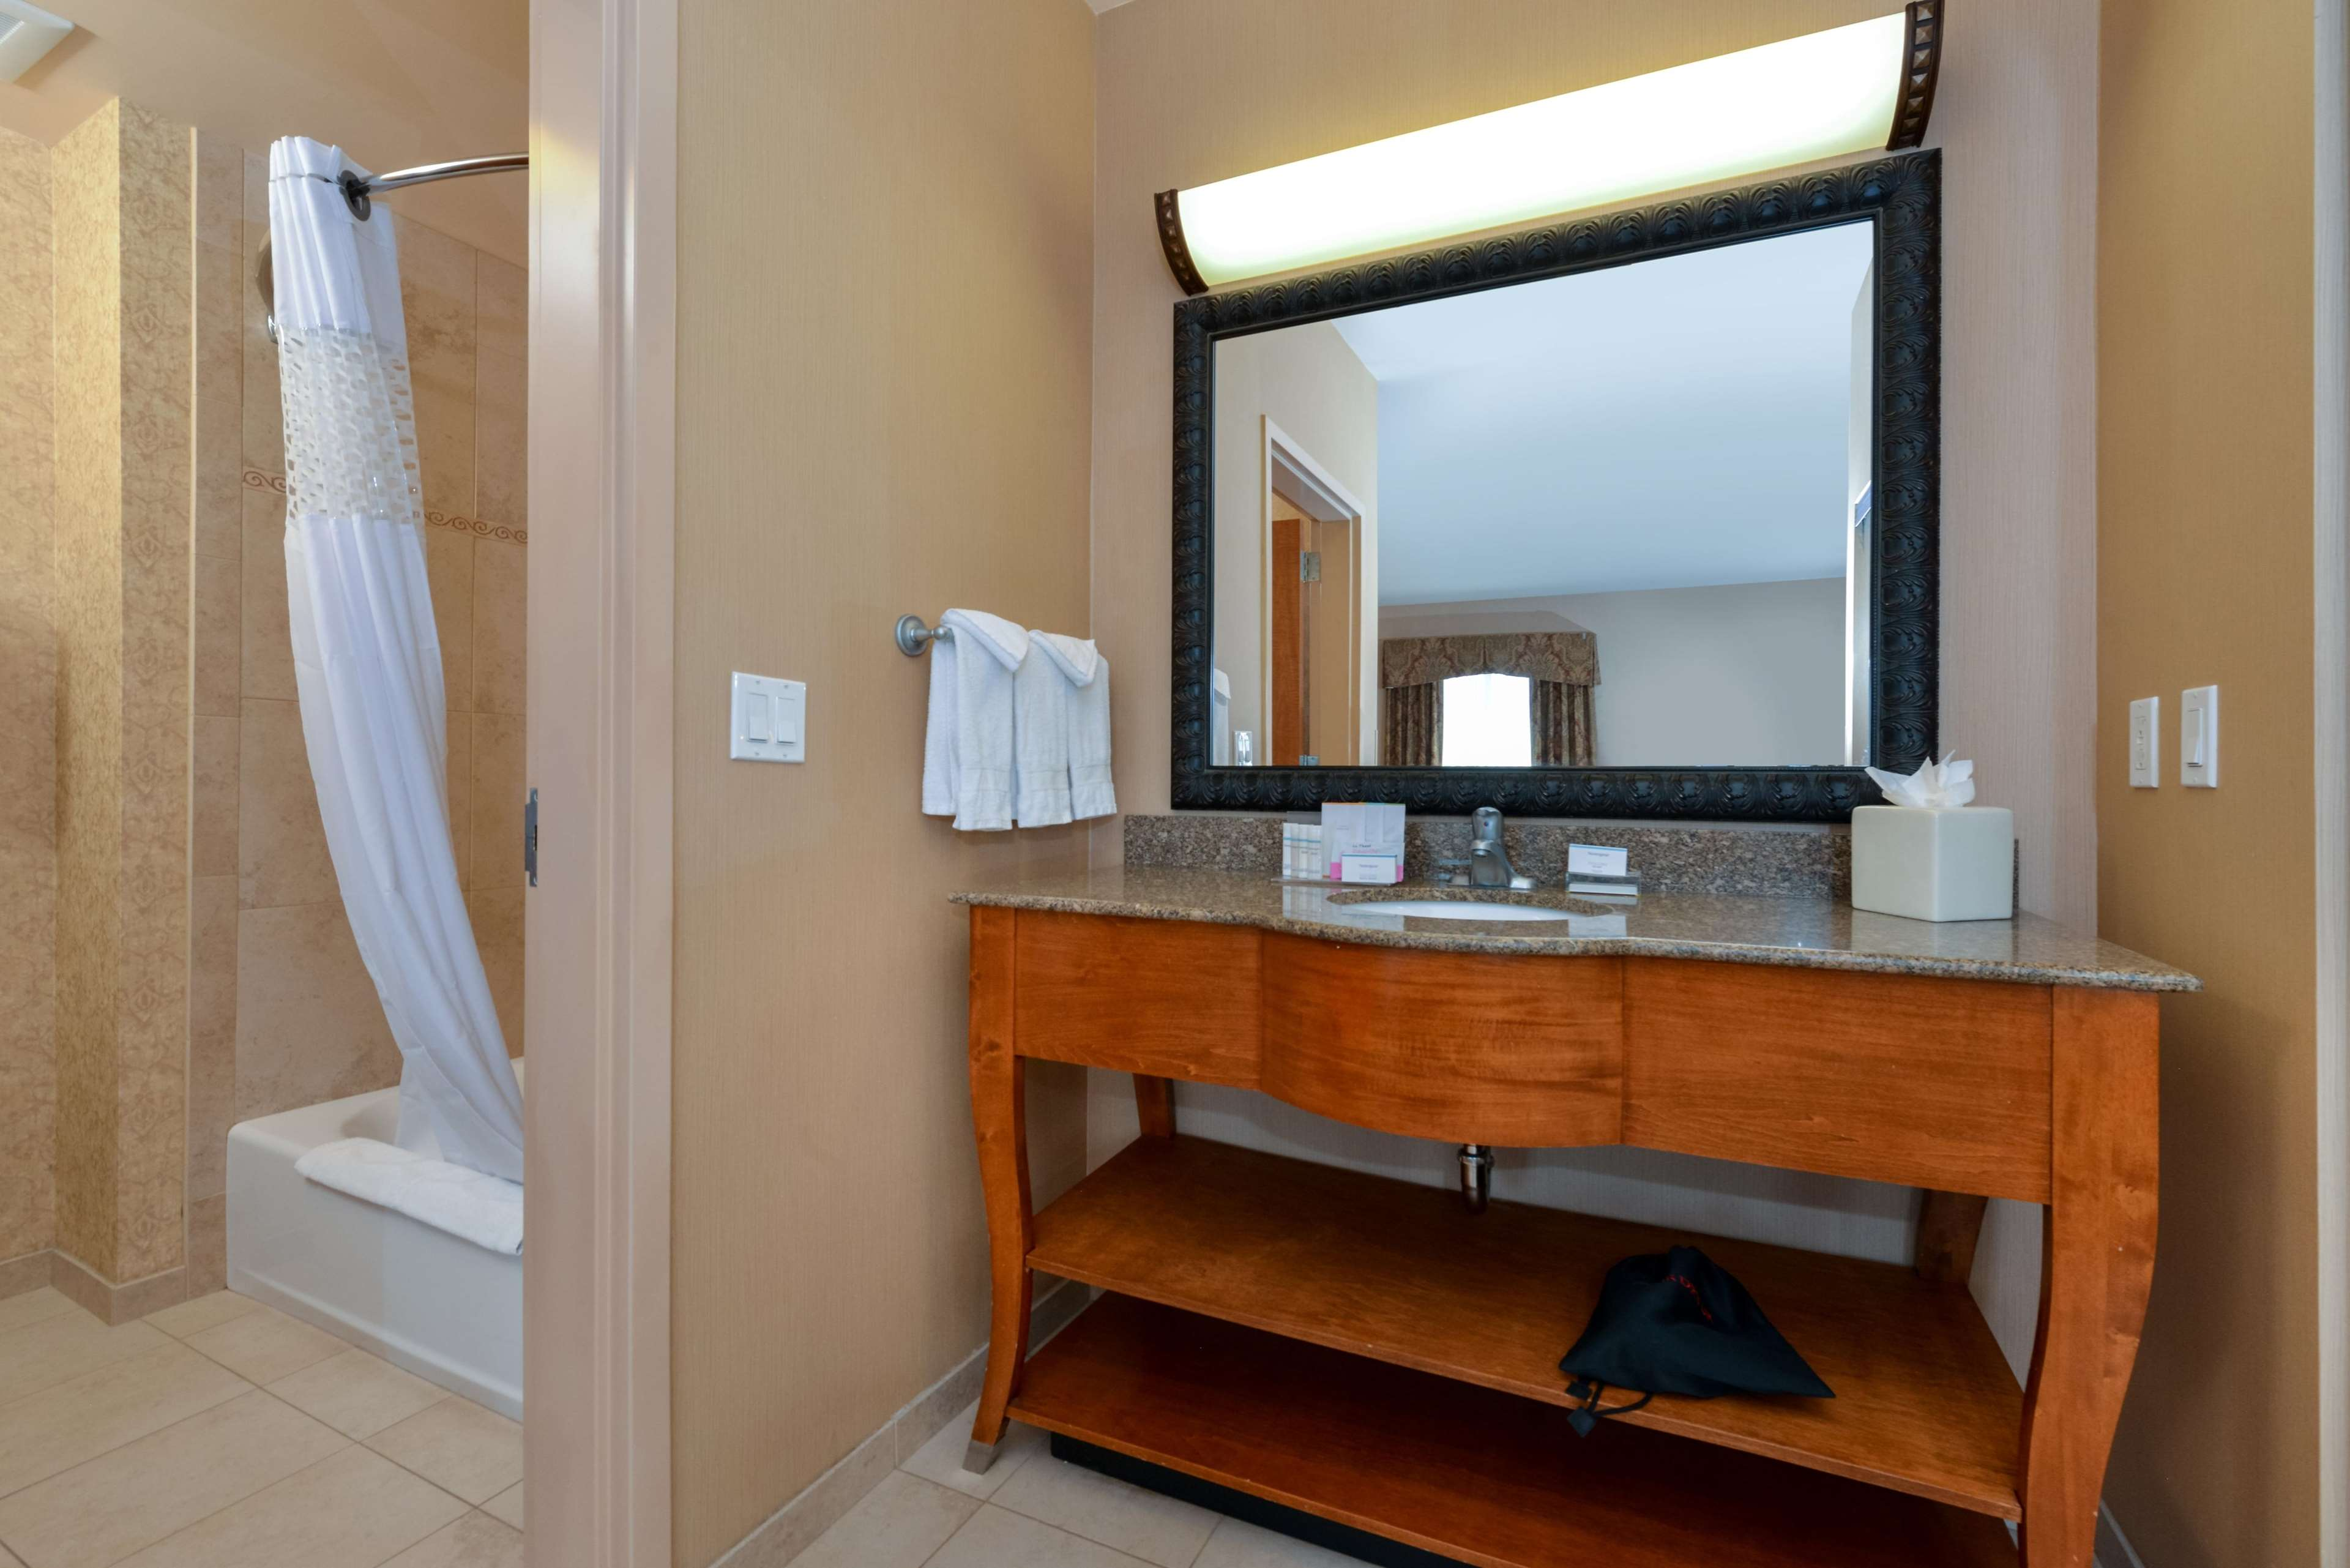 Hampton Inn & Suites Salt Lake City-West Jordan image 41